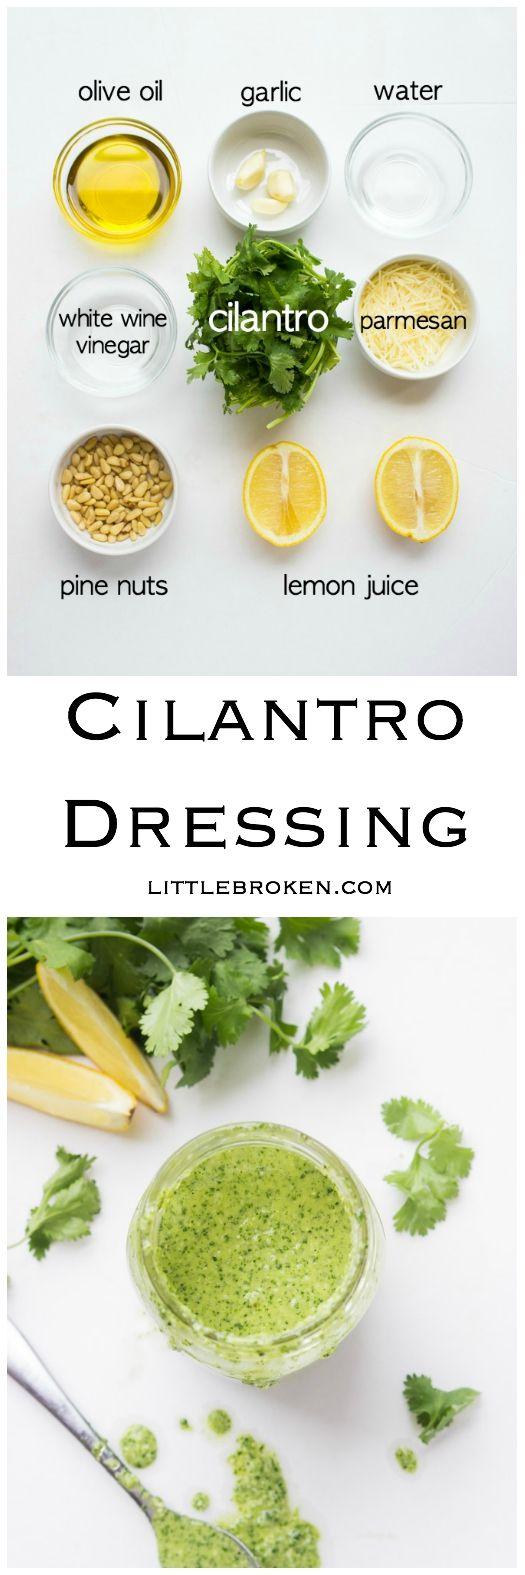 Fresh cilantro salad dressing made in about 5 minutes. Toss it with salad, pasta, quinoa. Pour it over shrimp, chicken or steak. | littlebroken.com @littlebroken